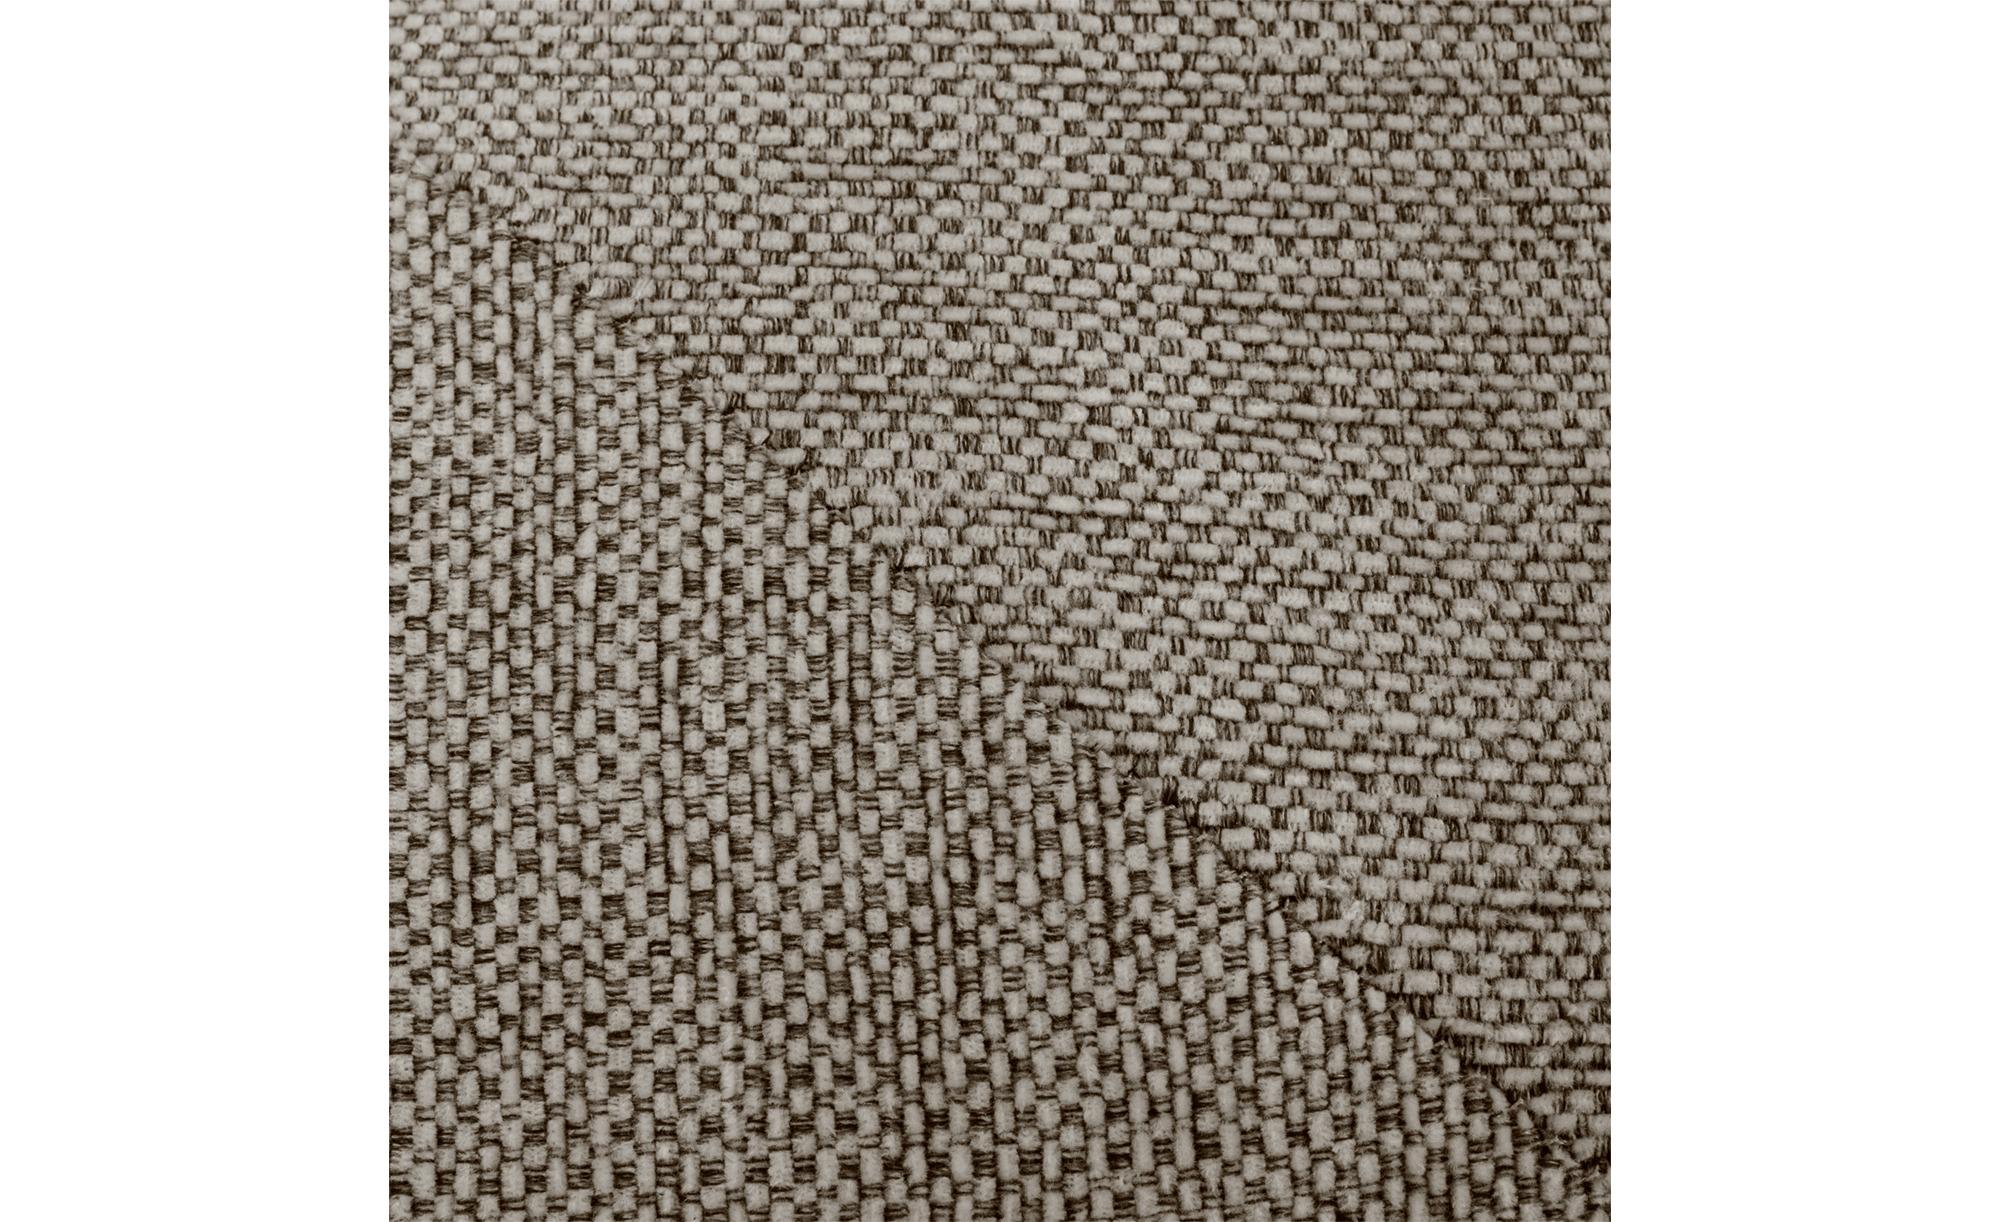 SOHO Ecksofa braun - Webstoff Paulina ¦ beige ¦ Maße (cm): H: 80 Polstermöbel > Sofas > Ecksofas - Höffner